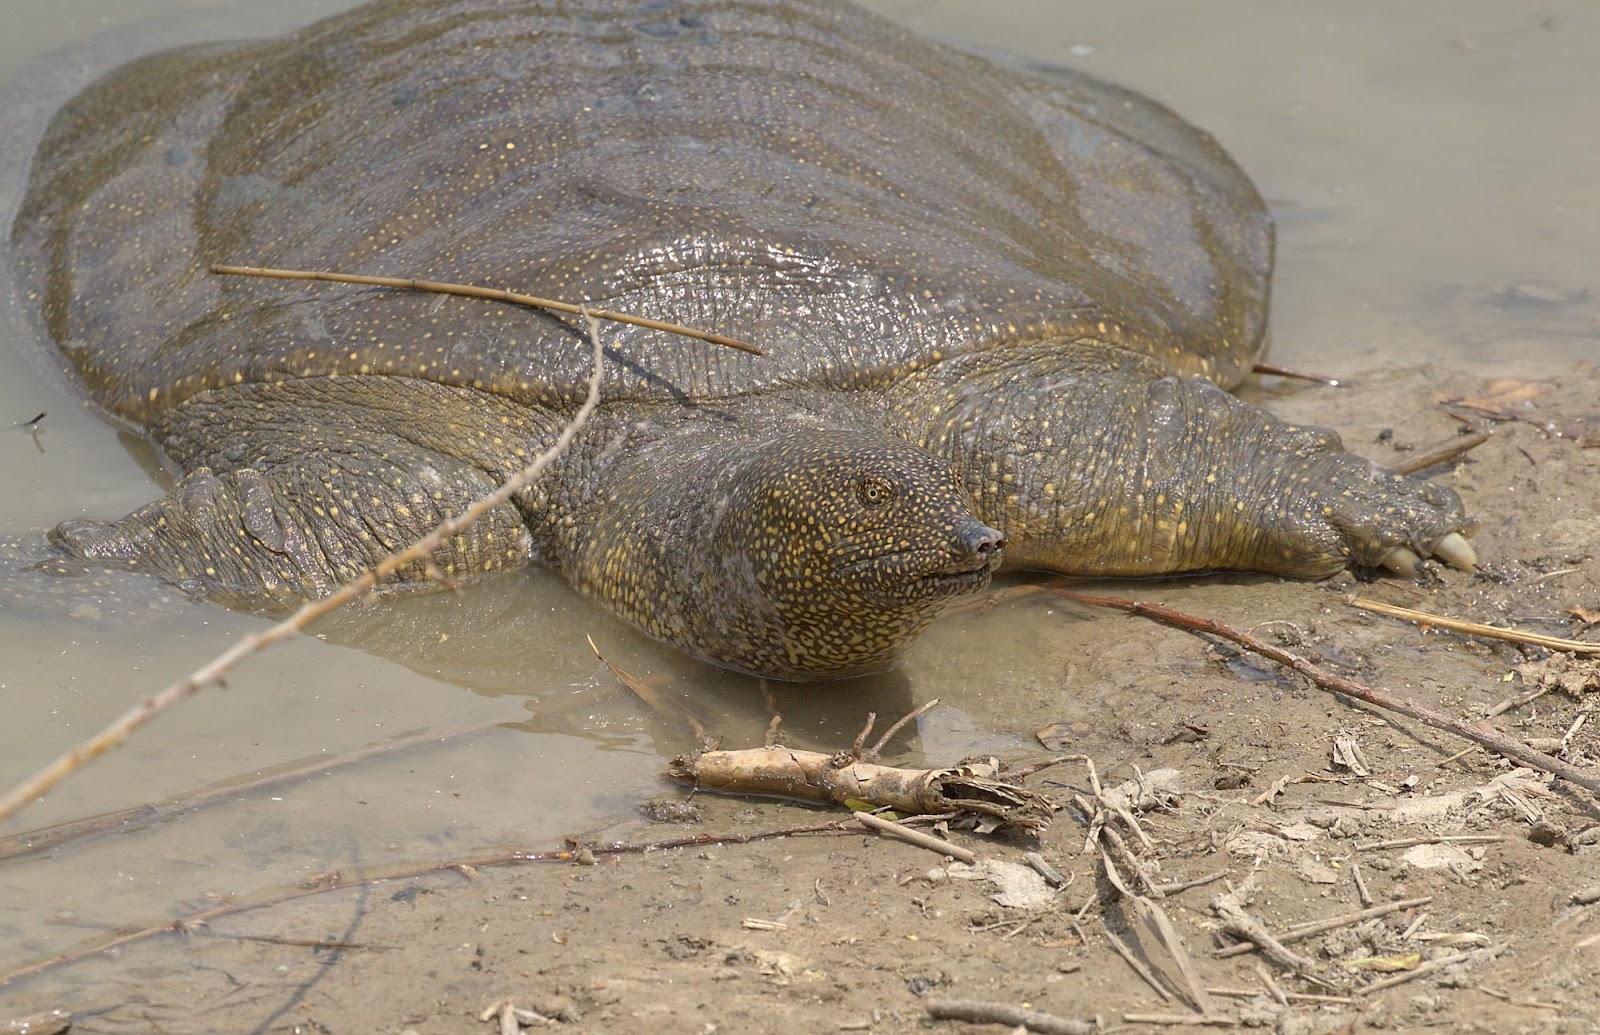 African softshell turtle2_rsz.jpg